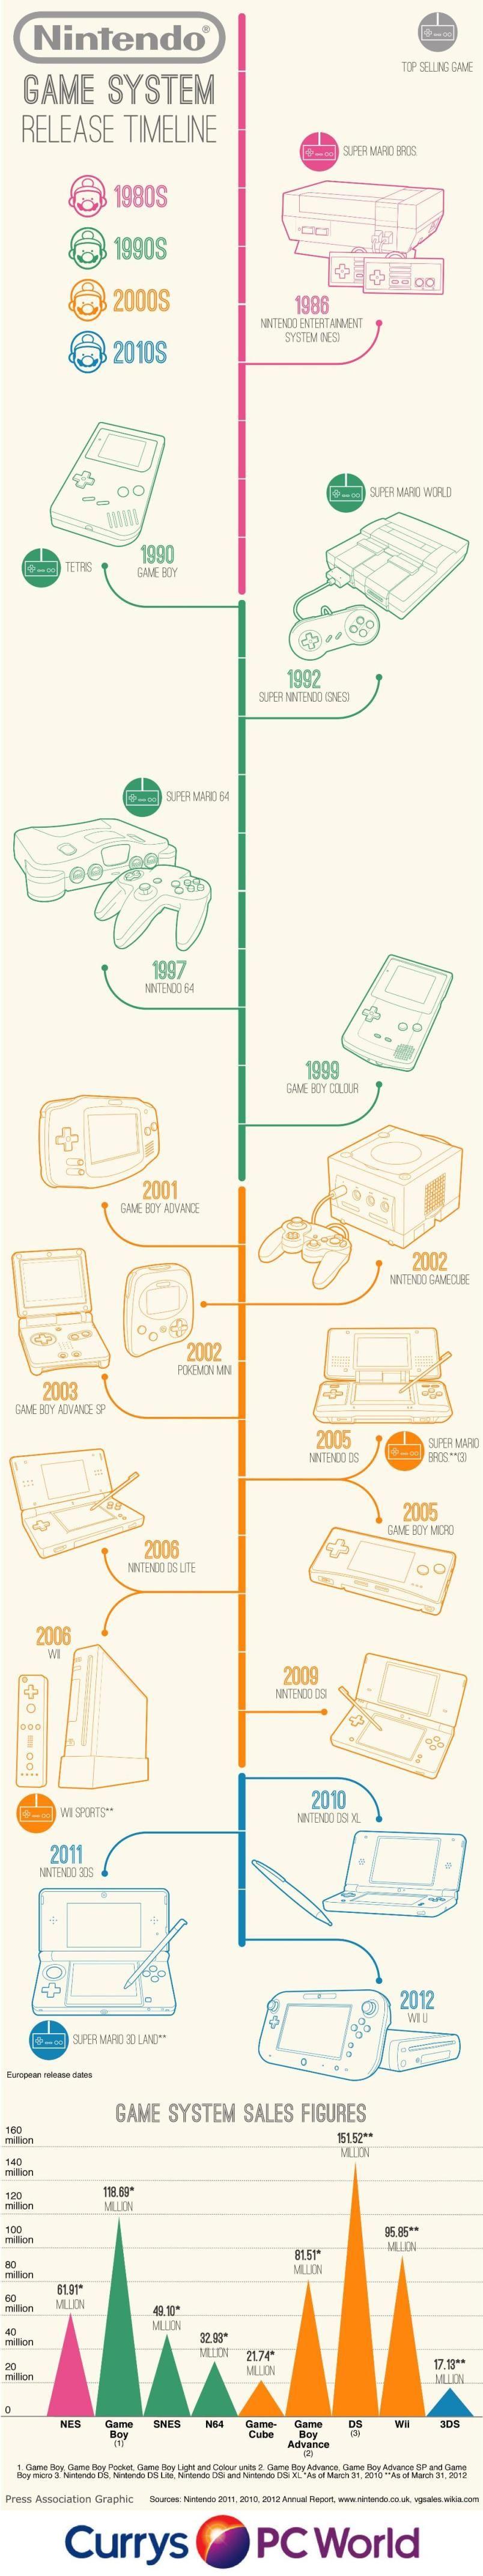 Nintendo-Timeline